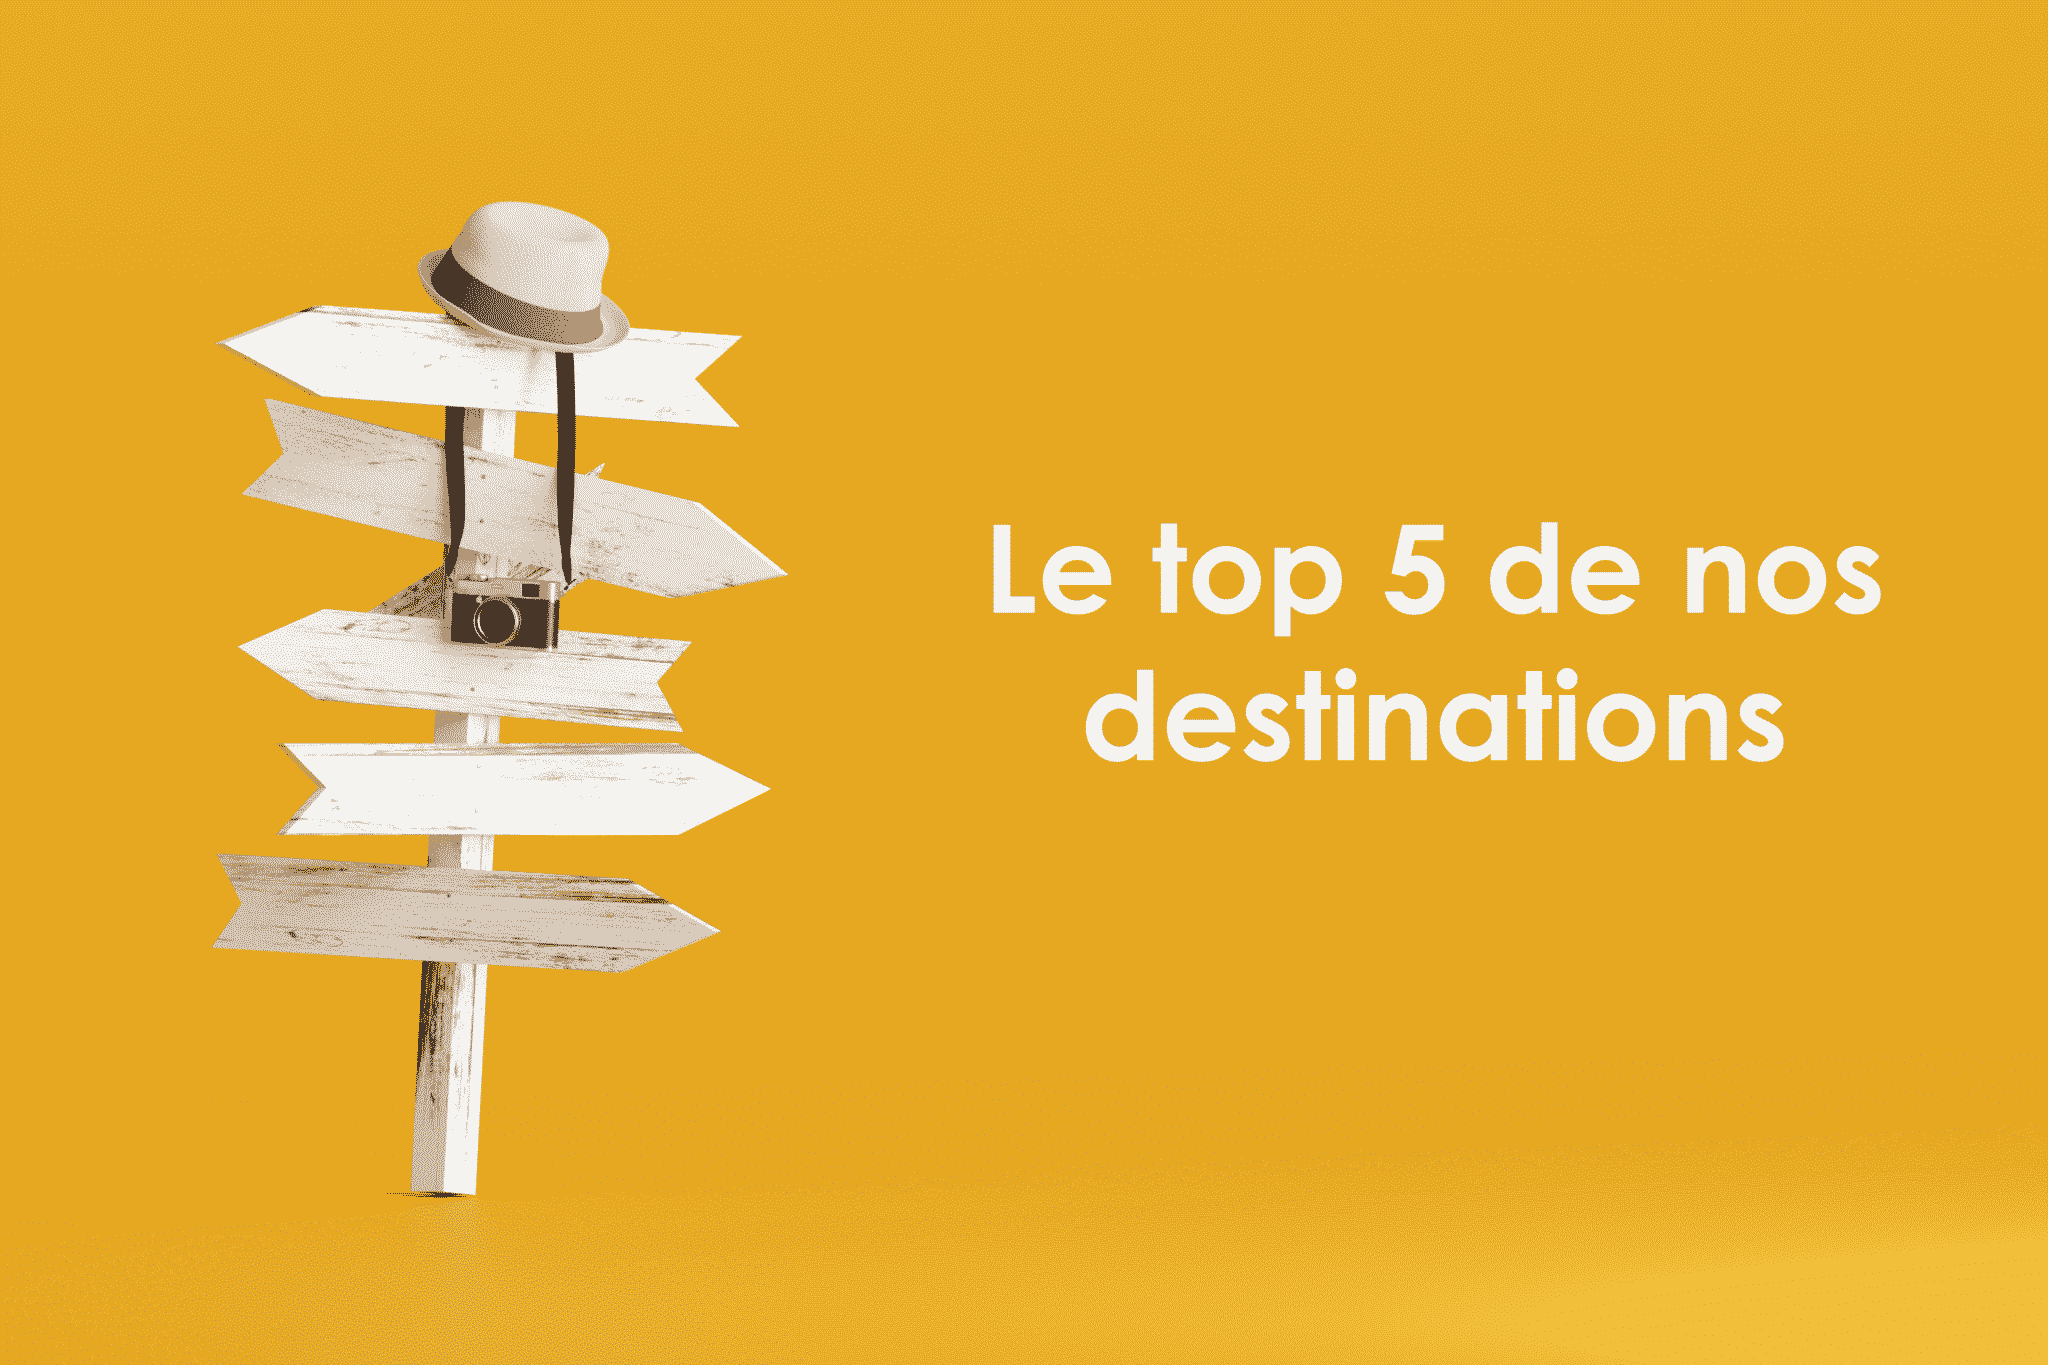 Top 5 de nos destinations